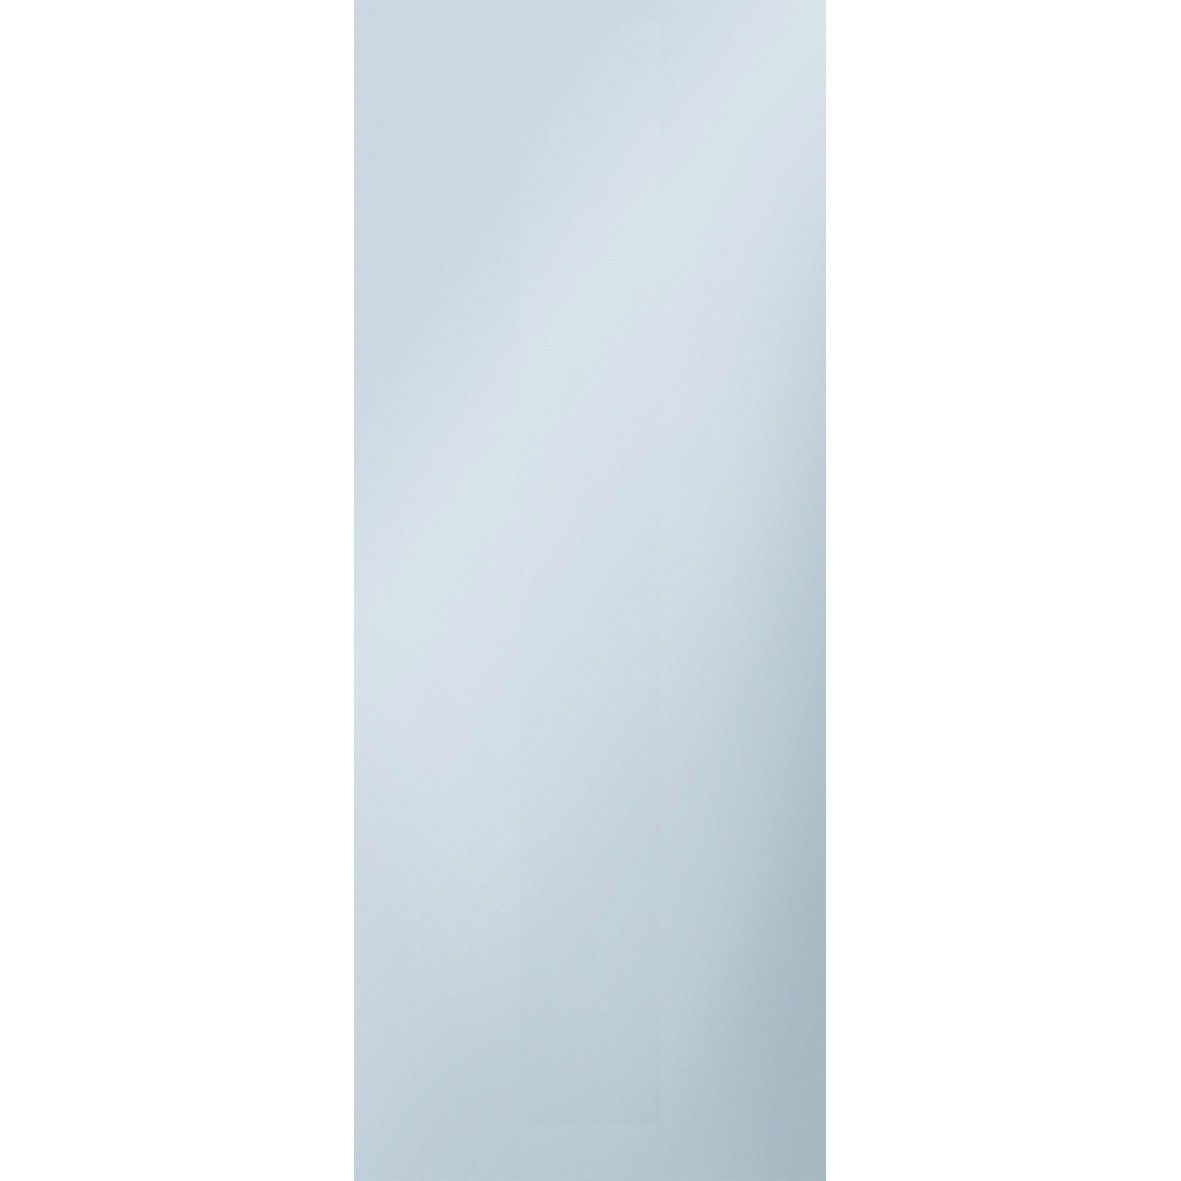 Porte coulissante verre tremp translucide eclisse 211 x 73 cm leroy merlin - Porte coulissante verre trempe leroy merlin ...